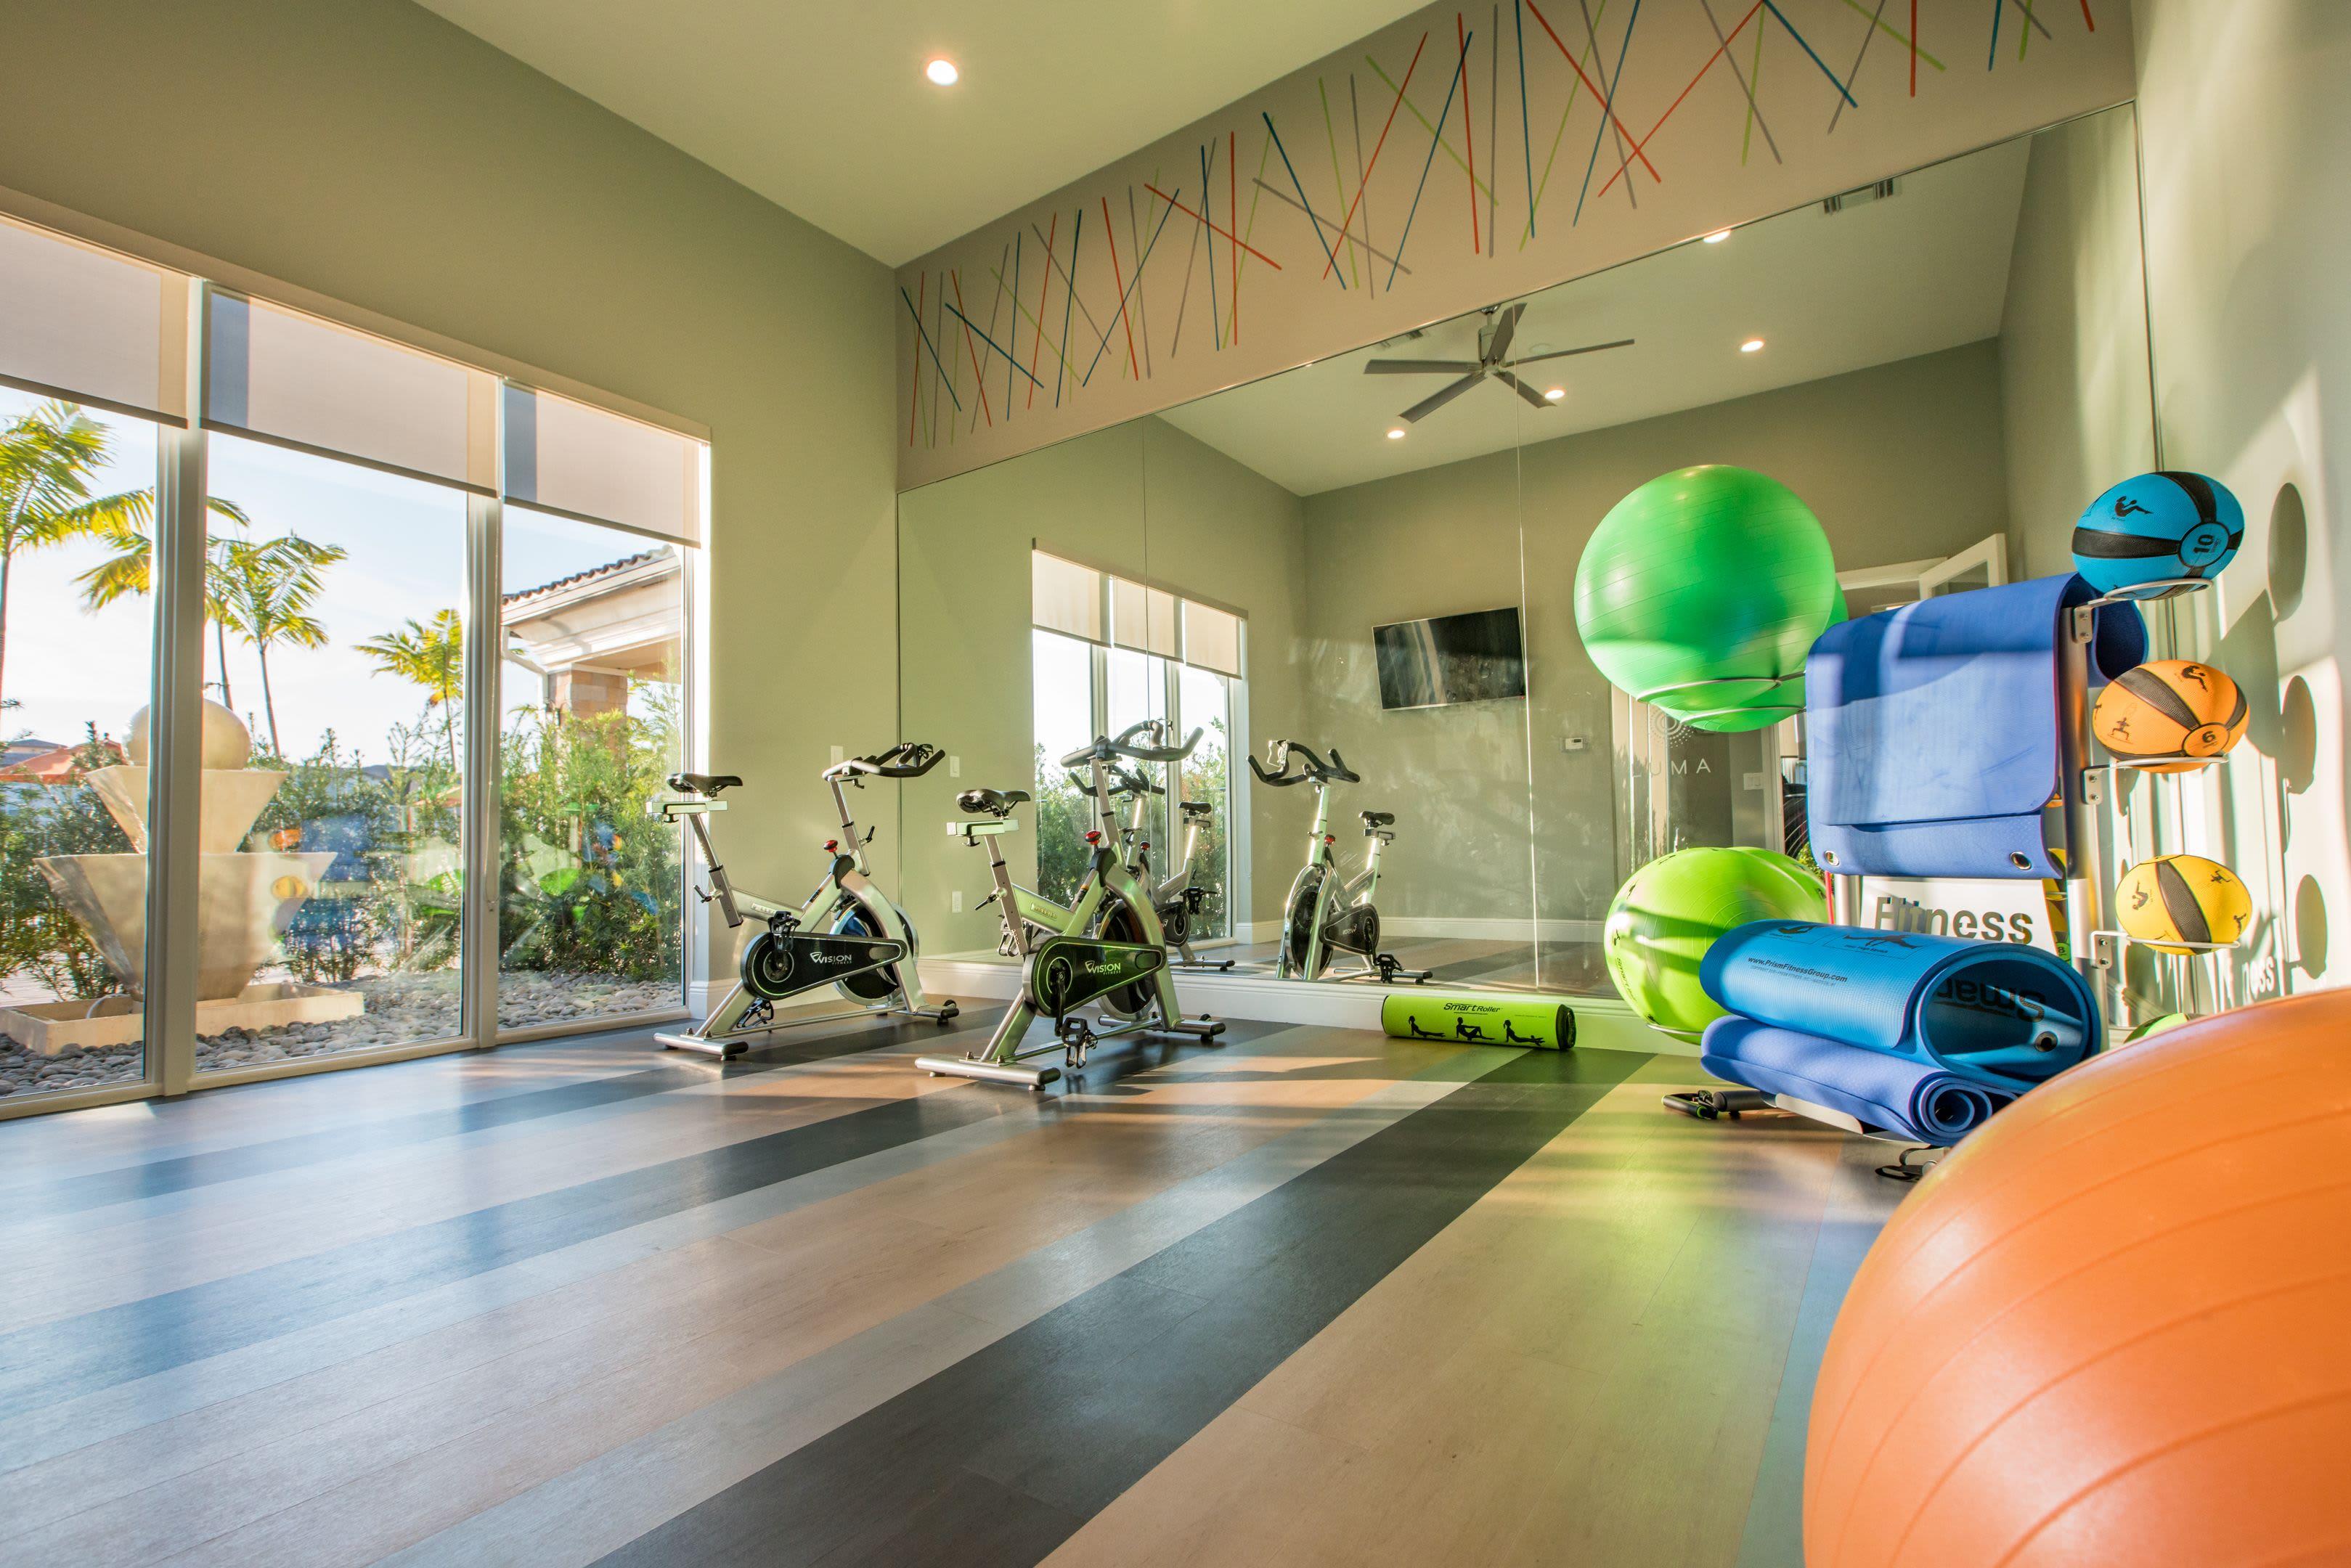 Fitness Facility at Luma Miramar Apartments in Miramar, Florida.